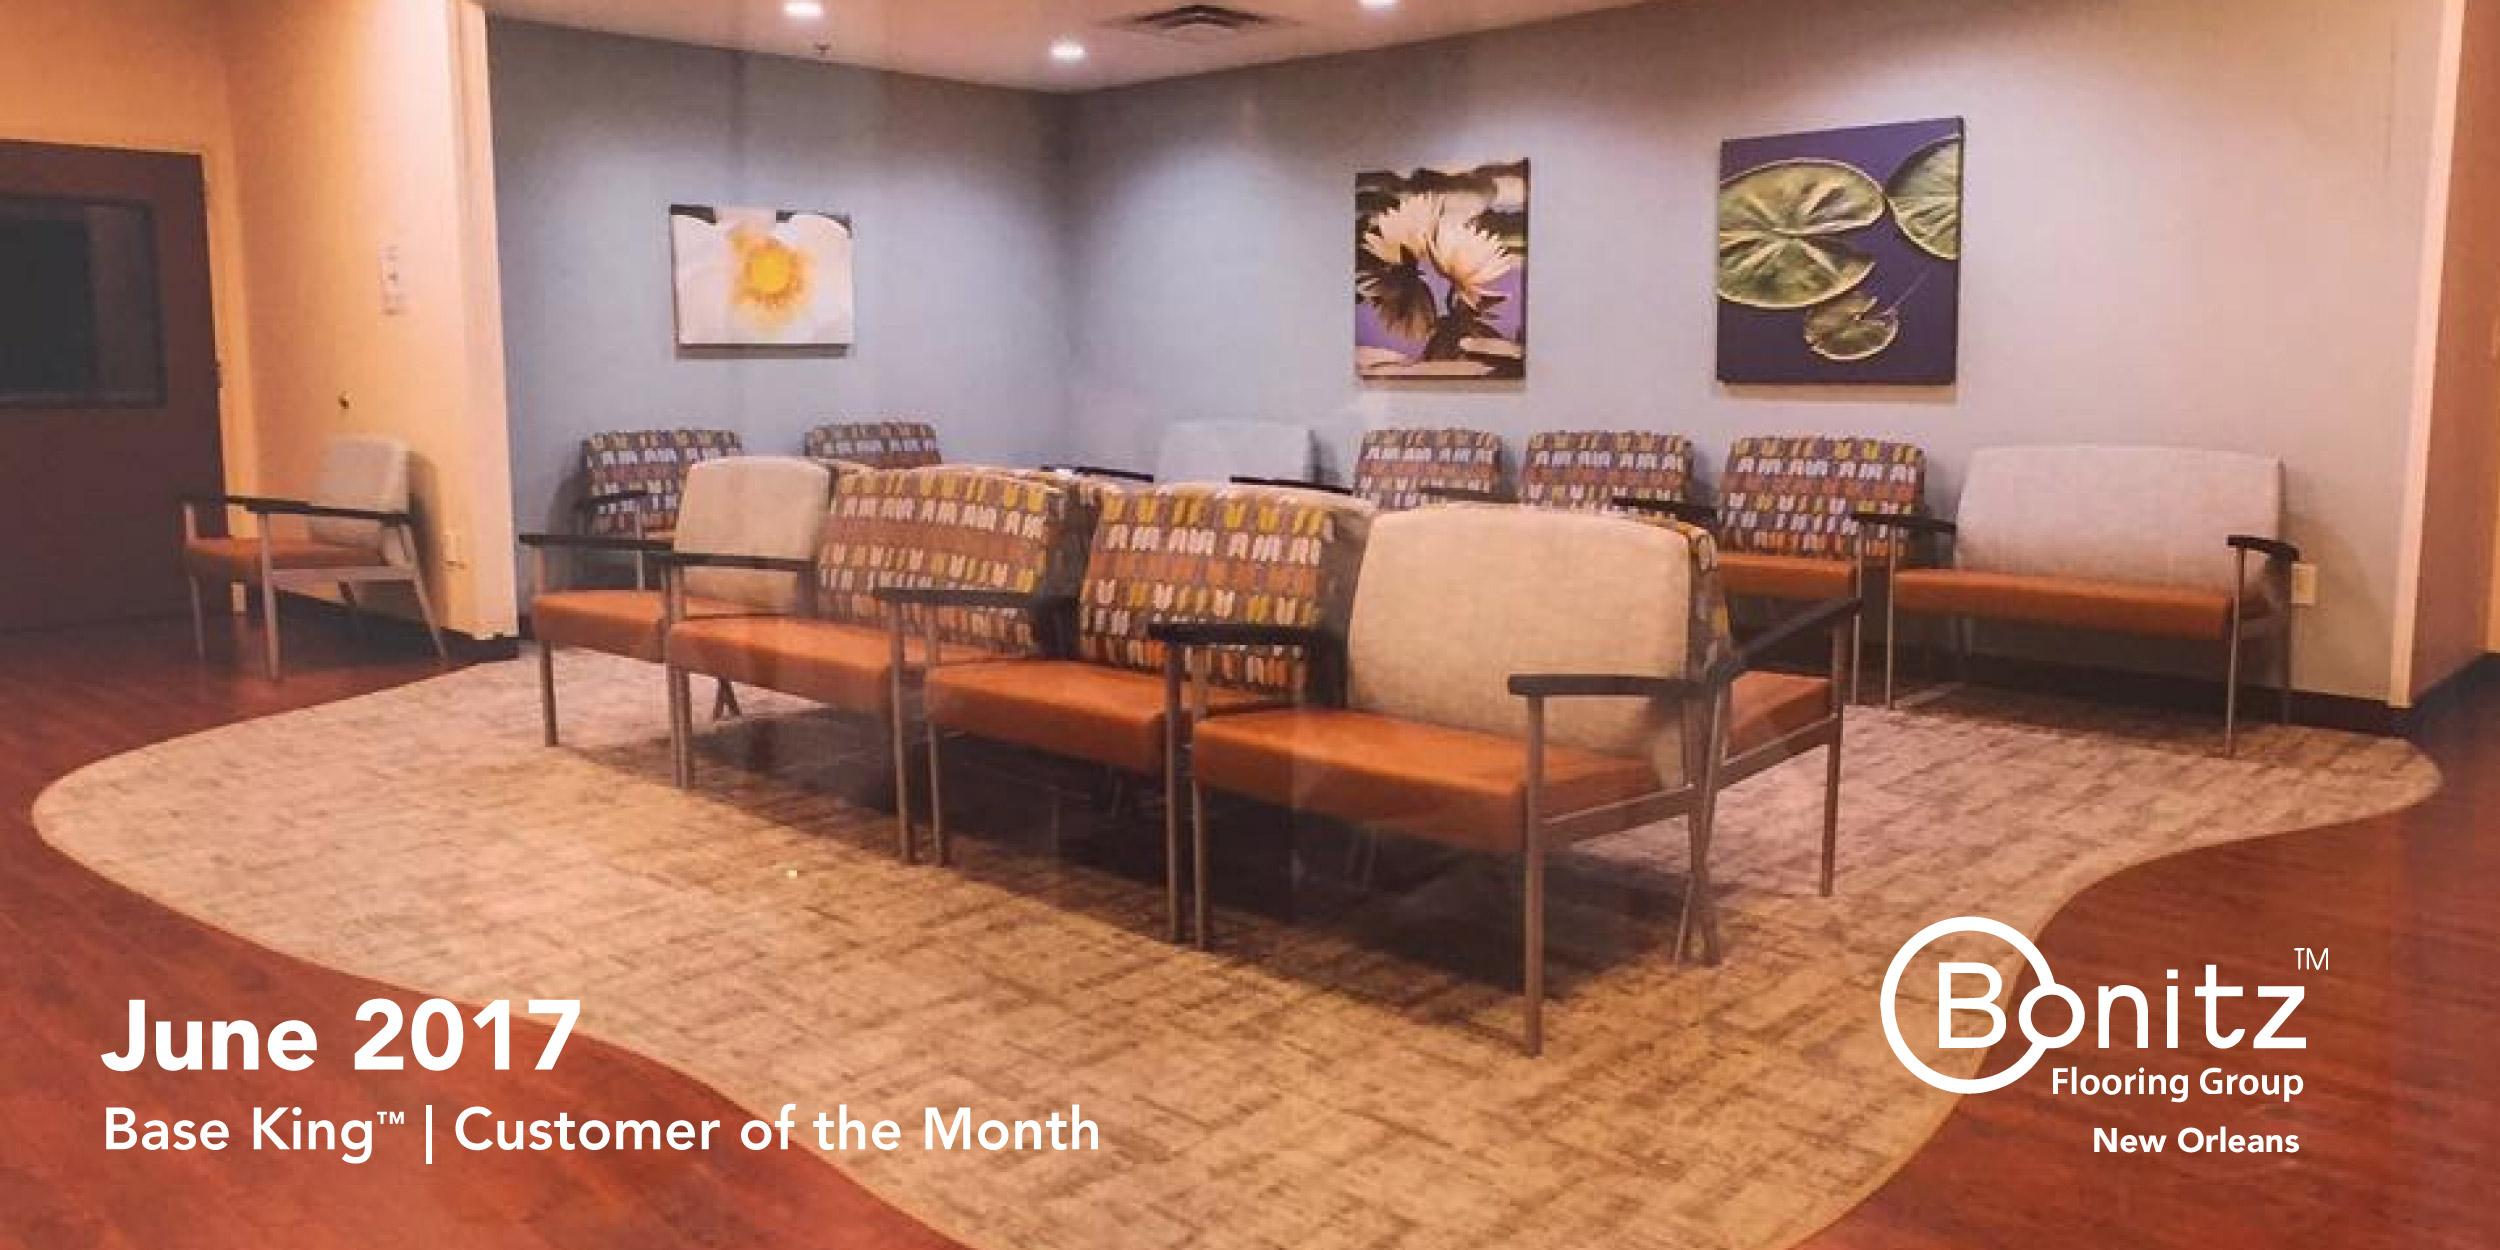 June 2017 Customer Of The Month Bonitz Flooring Group